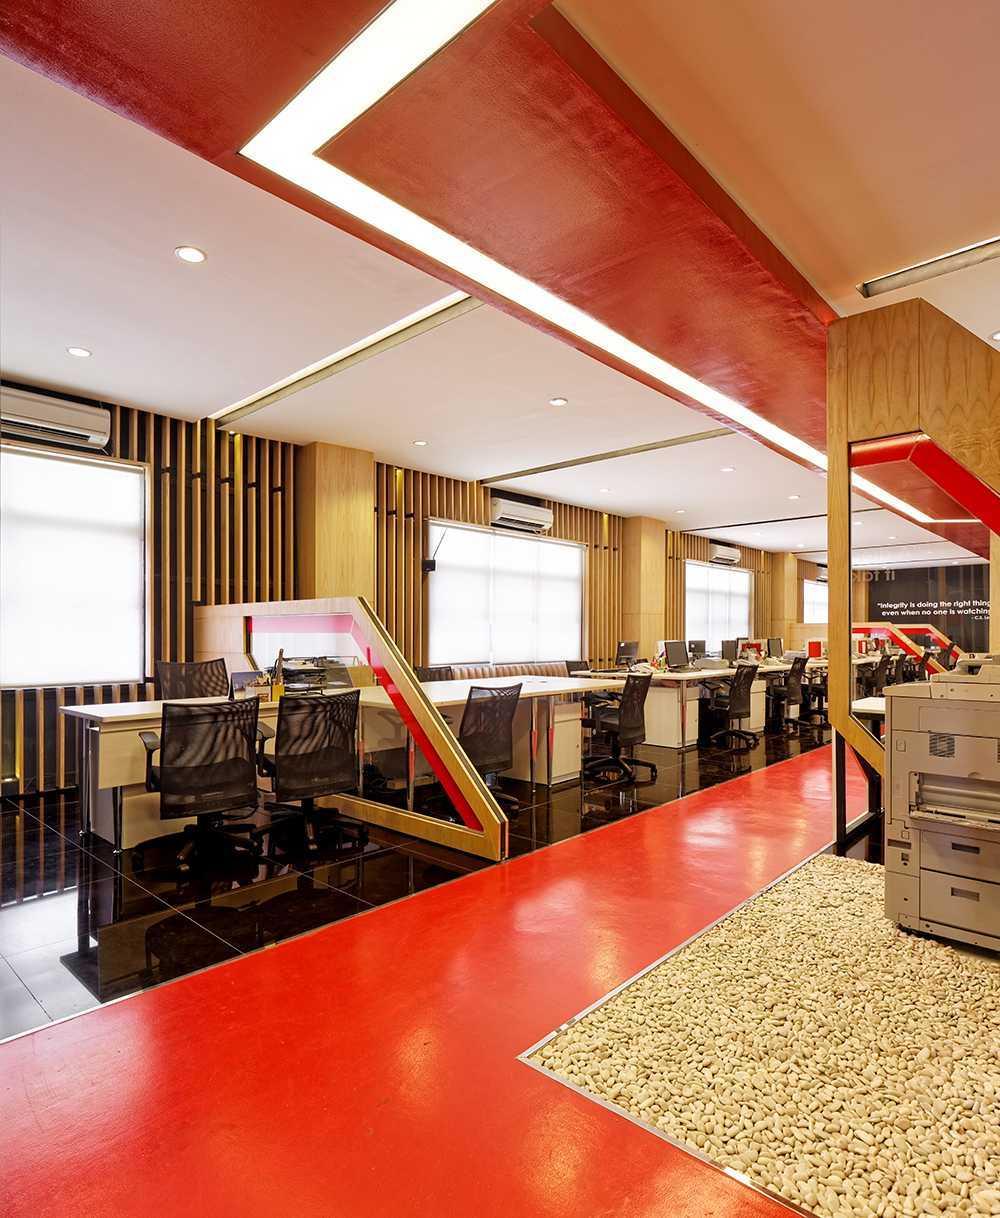 Delution Omg Office Jl. Deplu Raya No.8, Rt.3/rw.3, Bintaro, Pesanggrahan, Kota Jakarta Selatan, Daerah Khusus Ibukota Jakarta 12330, Indonesia Jakarta, Indonesia Staff-Area Minimalis 12330